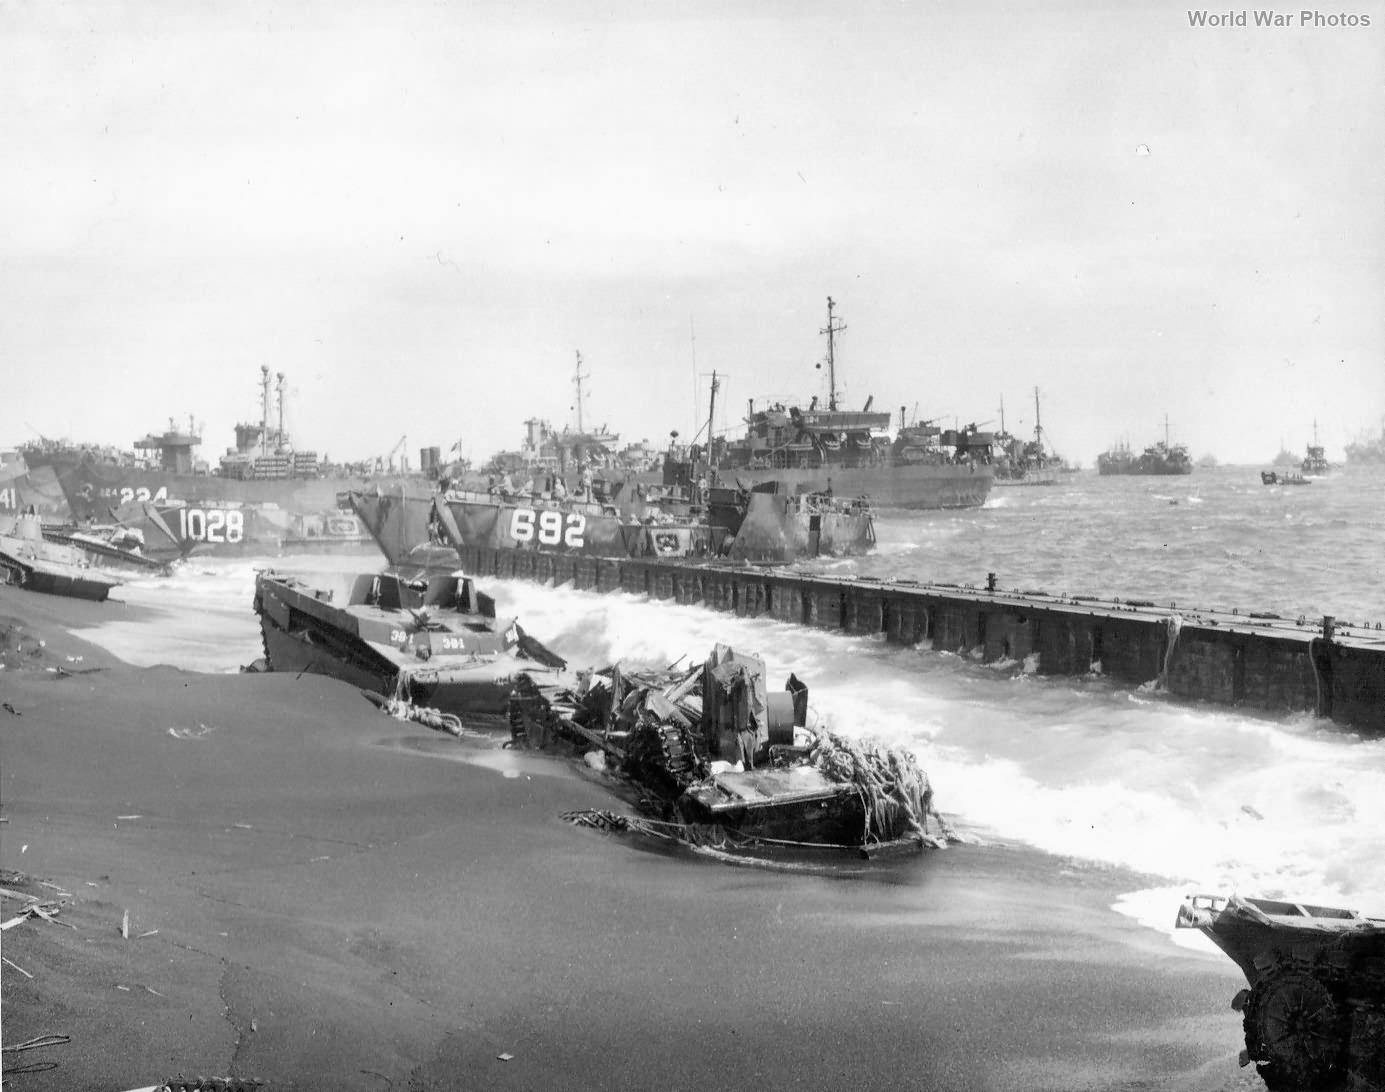 Equipment and ships on Red Beach 1 Iwo Jima